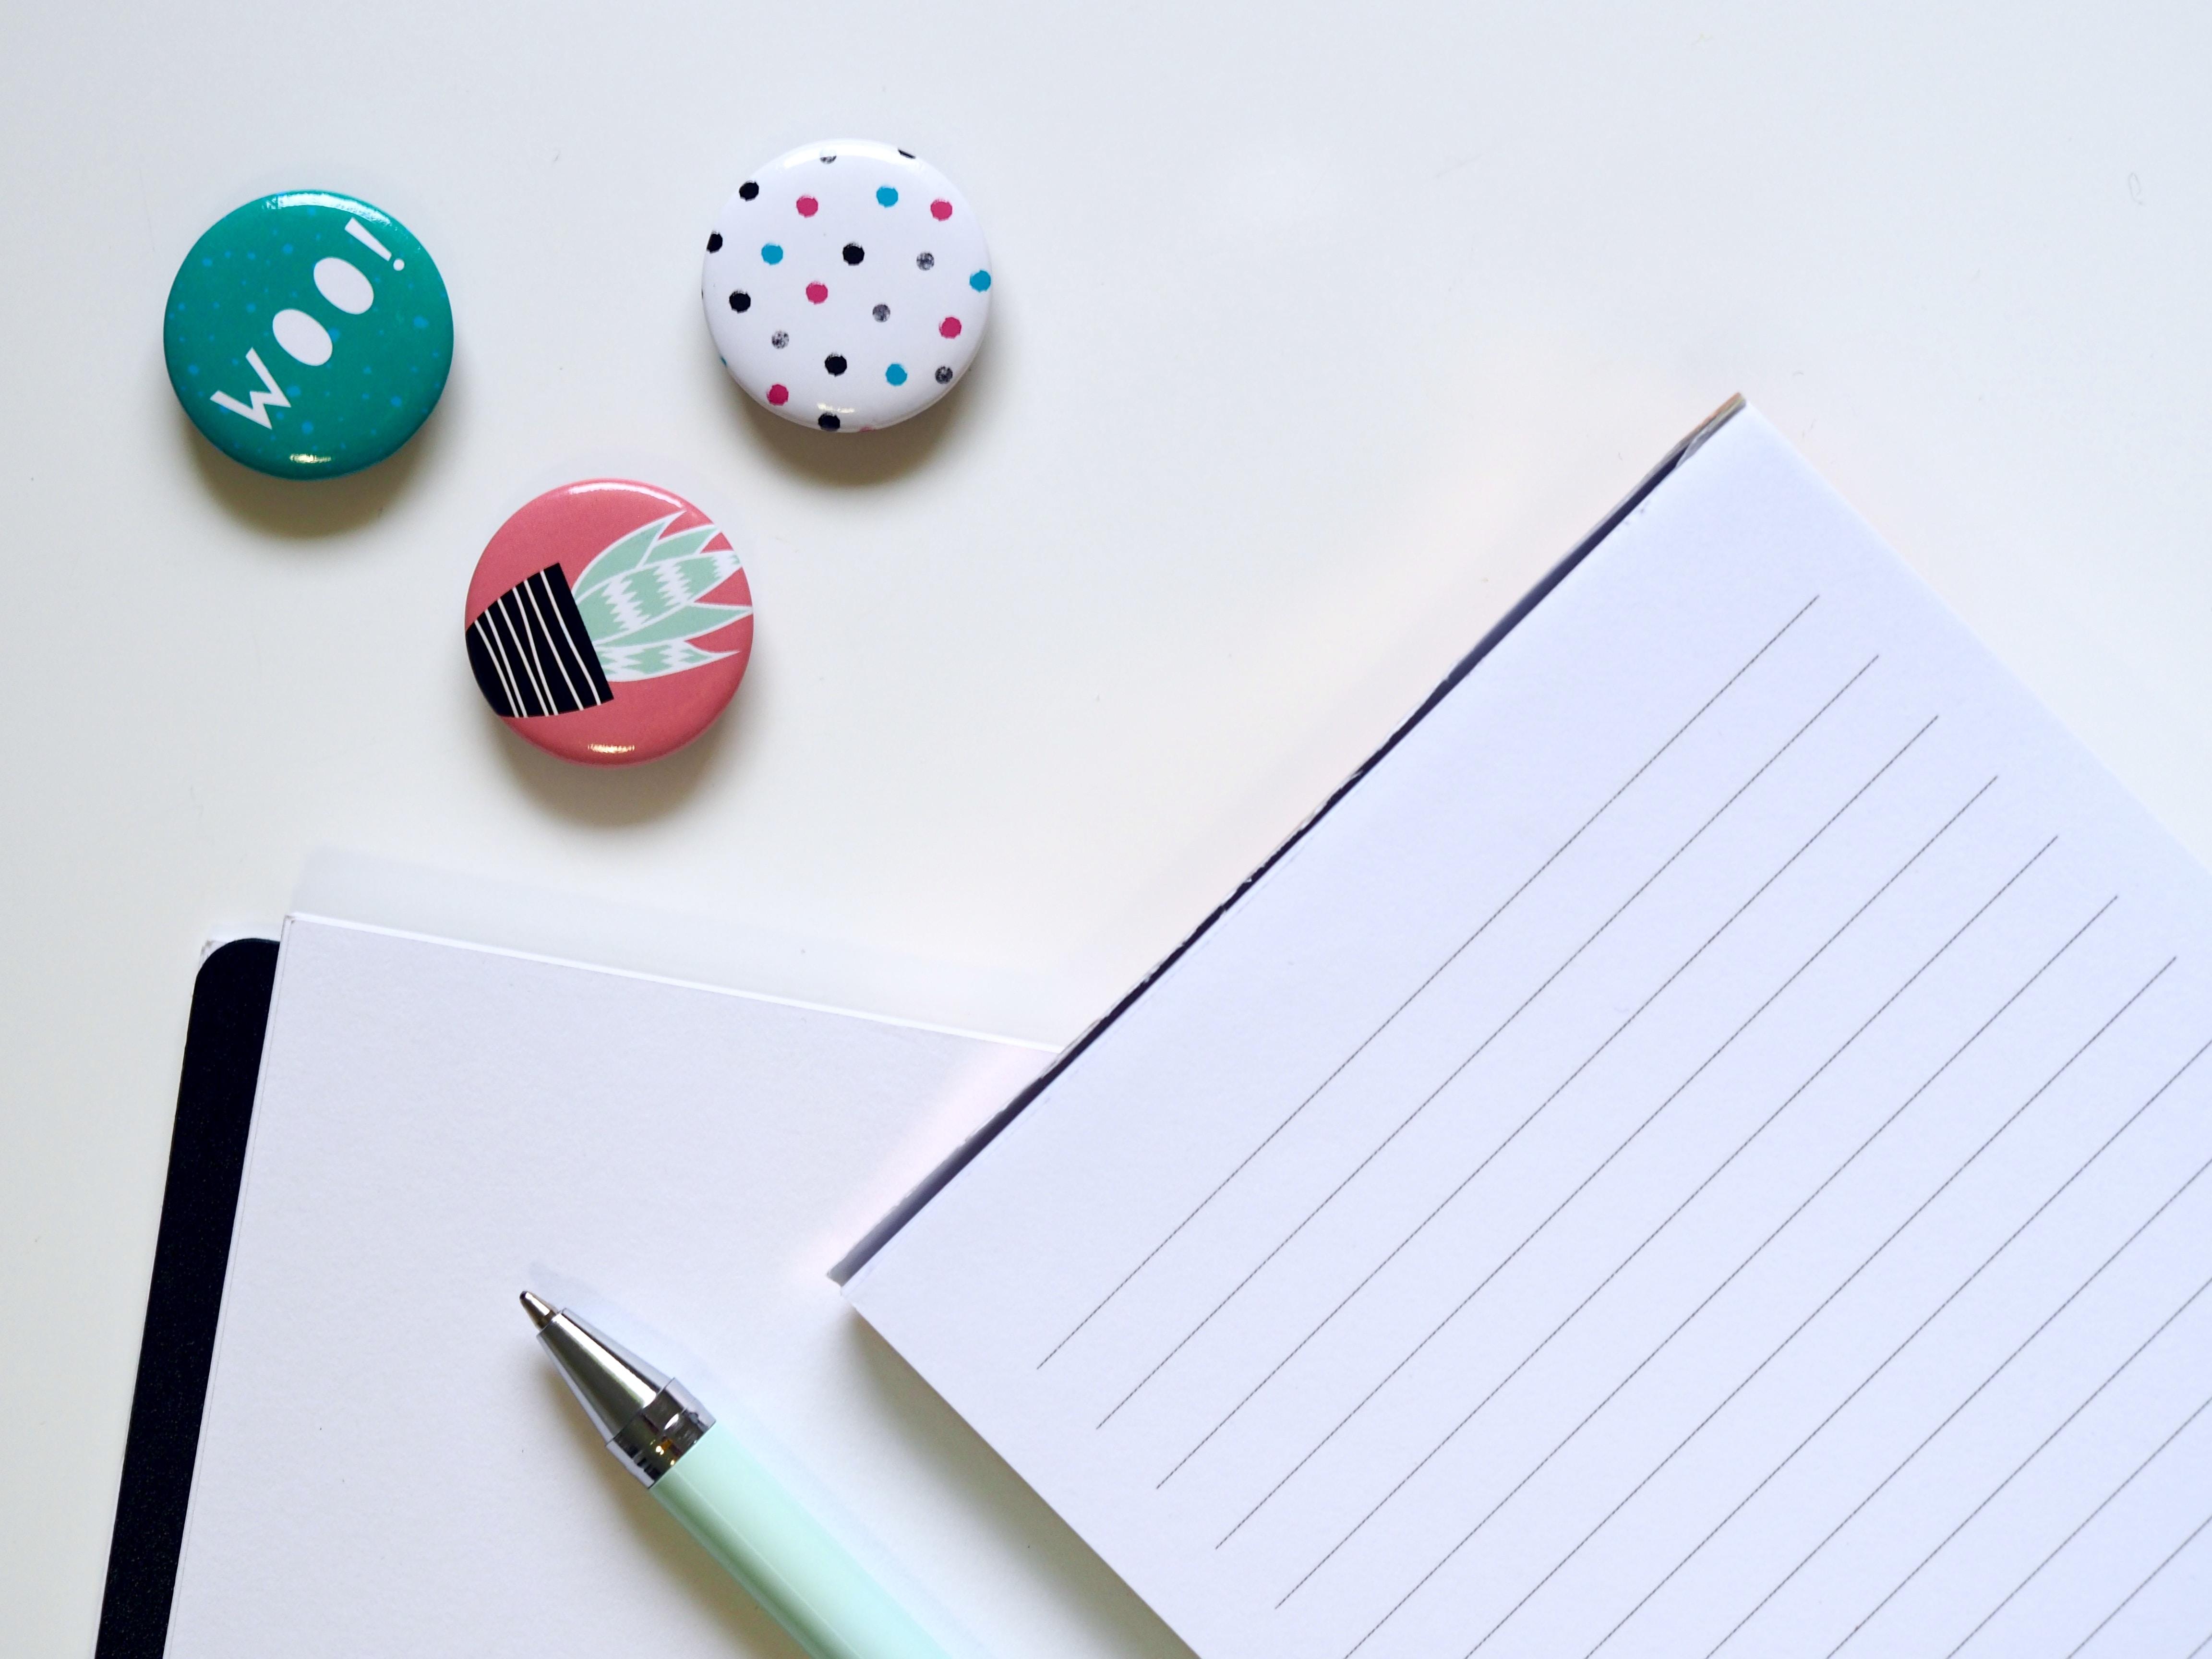 pen beside ruled paper